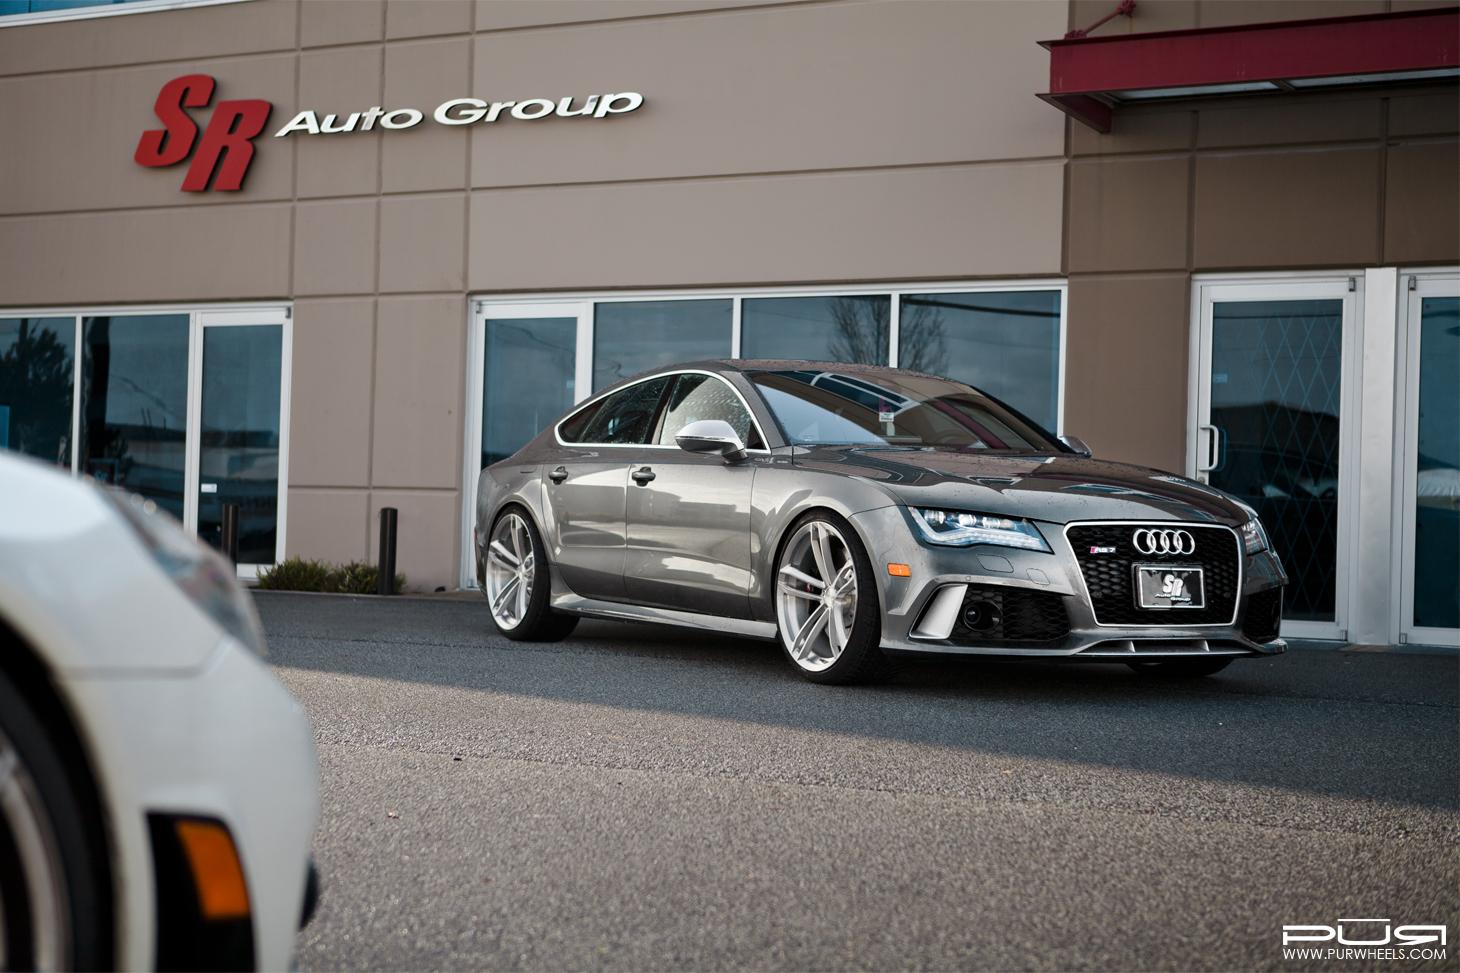 Pur Audi Rs7 21 Rs07 6speedonline Porsche Forum And Luxury